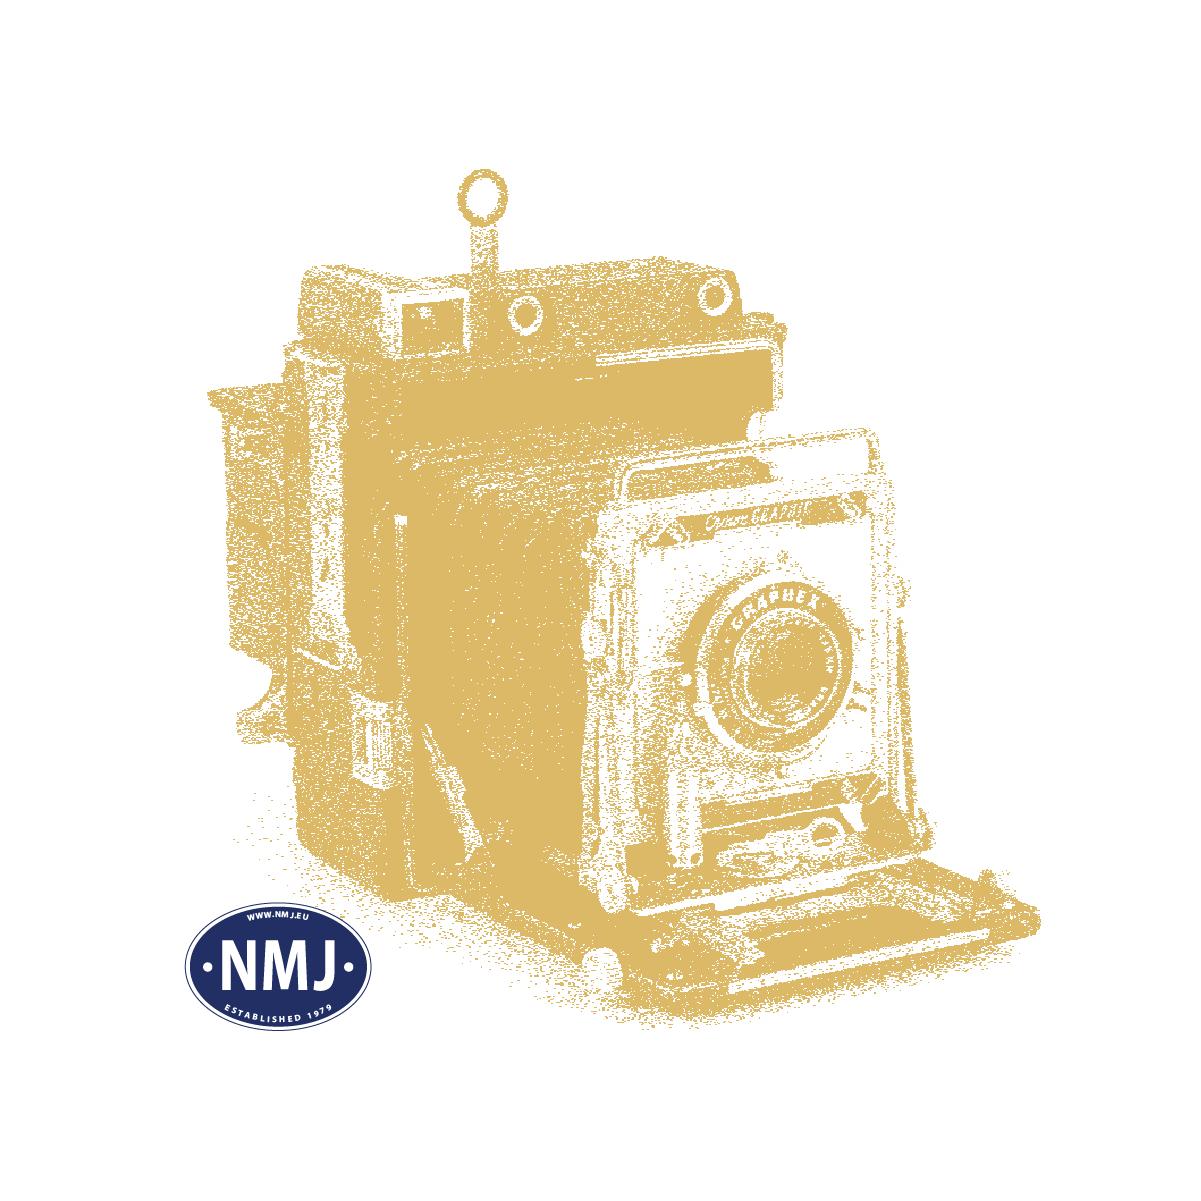 NMJT85.201 - NMJ Topline CargoNet Di8.702, DCC Digital mit Sound